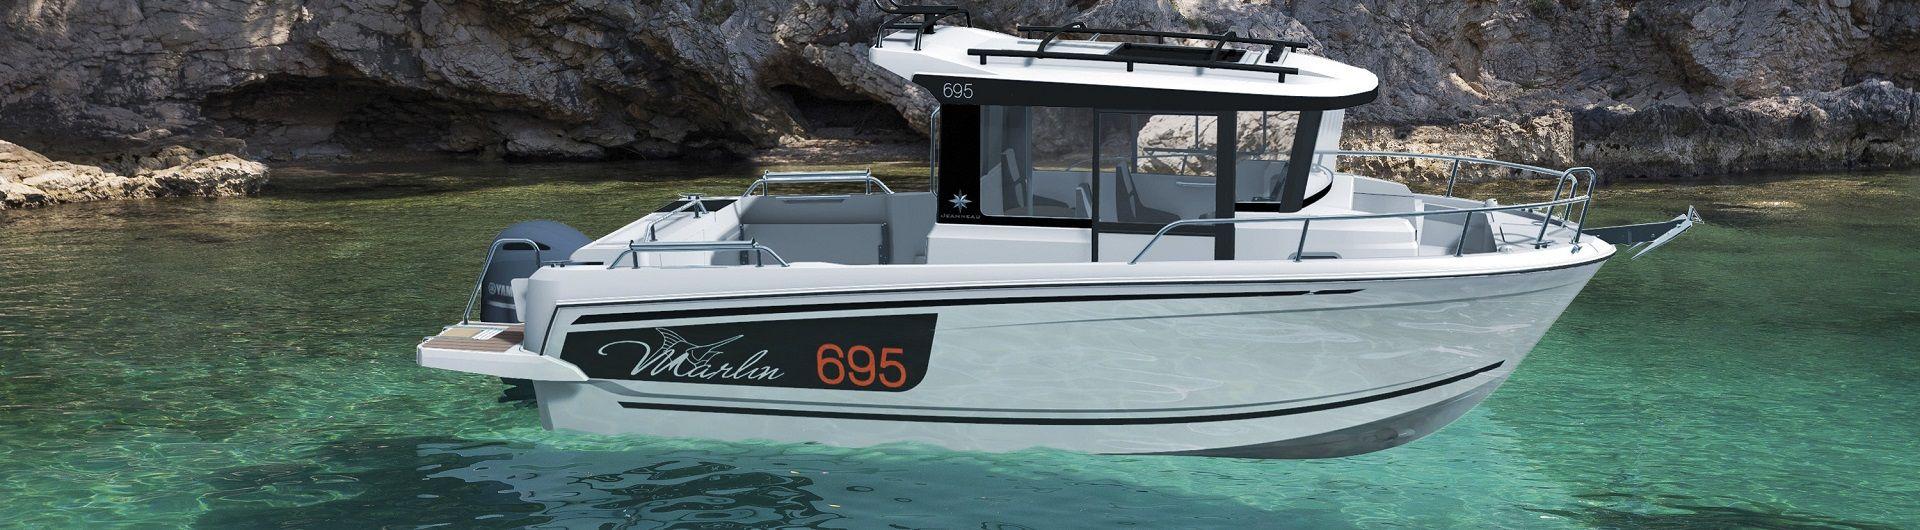 Sportboot Jeanneau Merry Fisher 695 Serie 2 Marlin Header